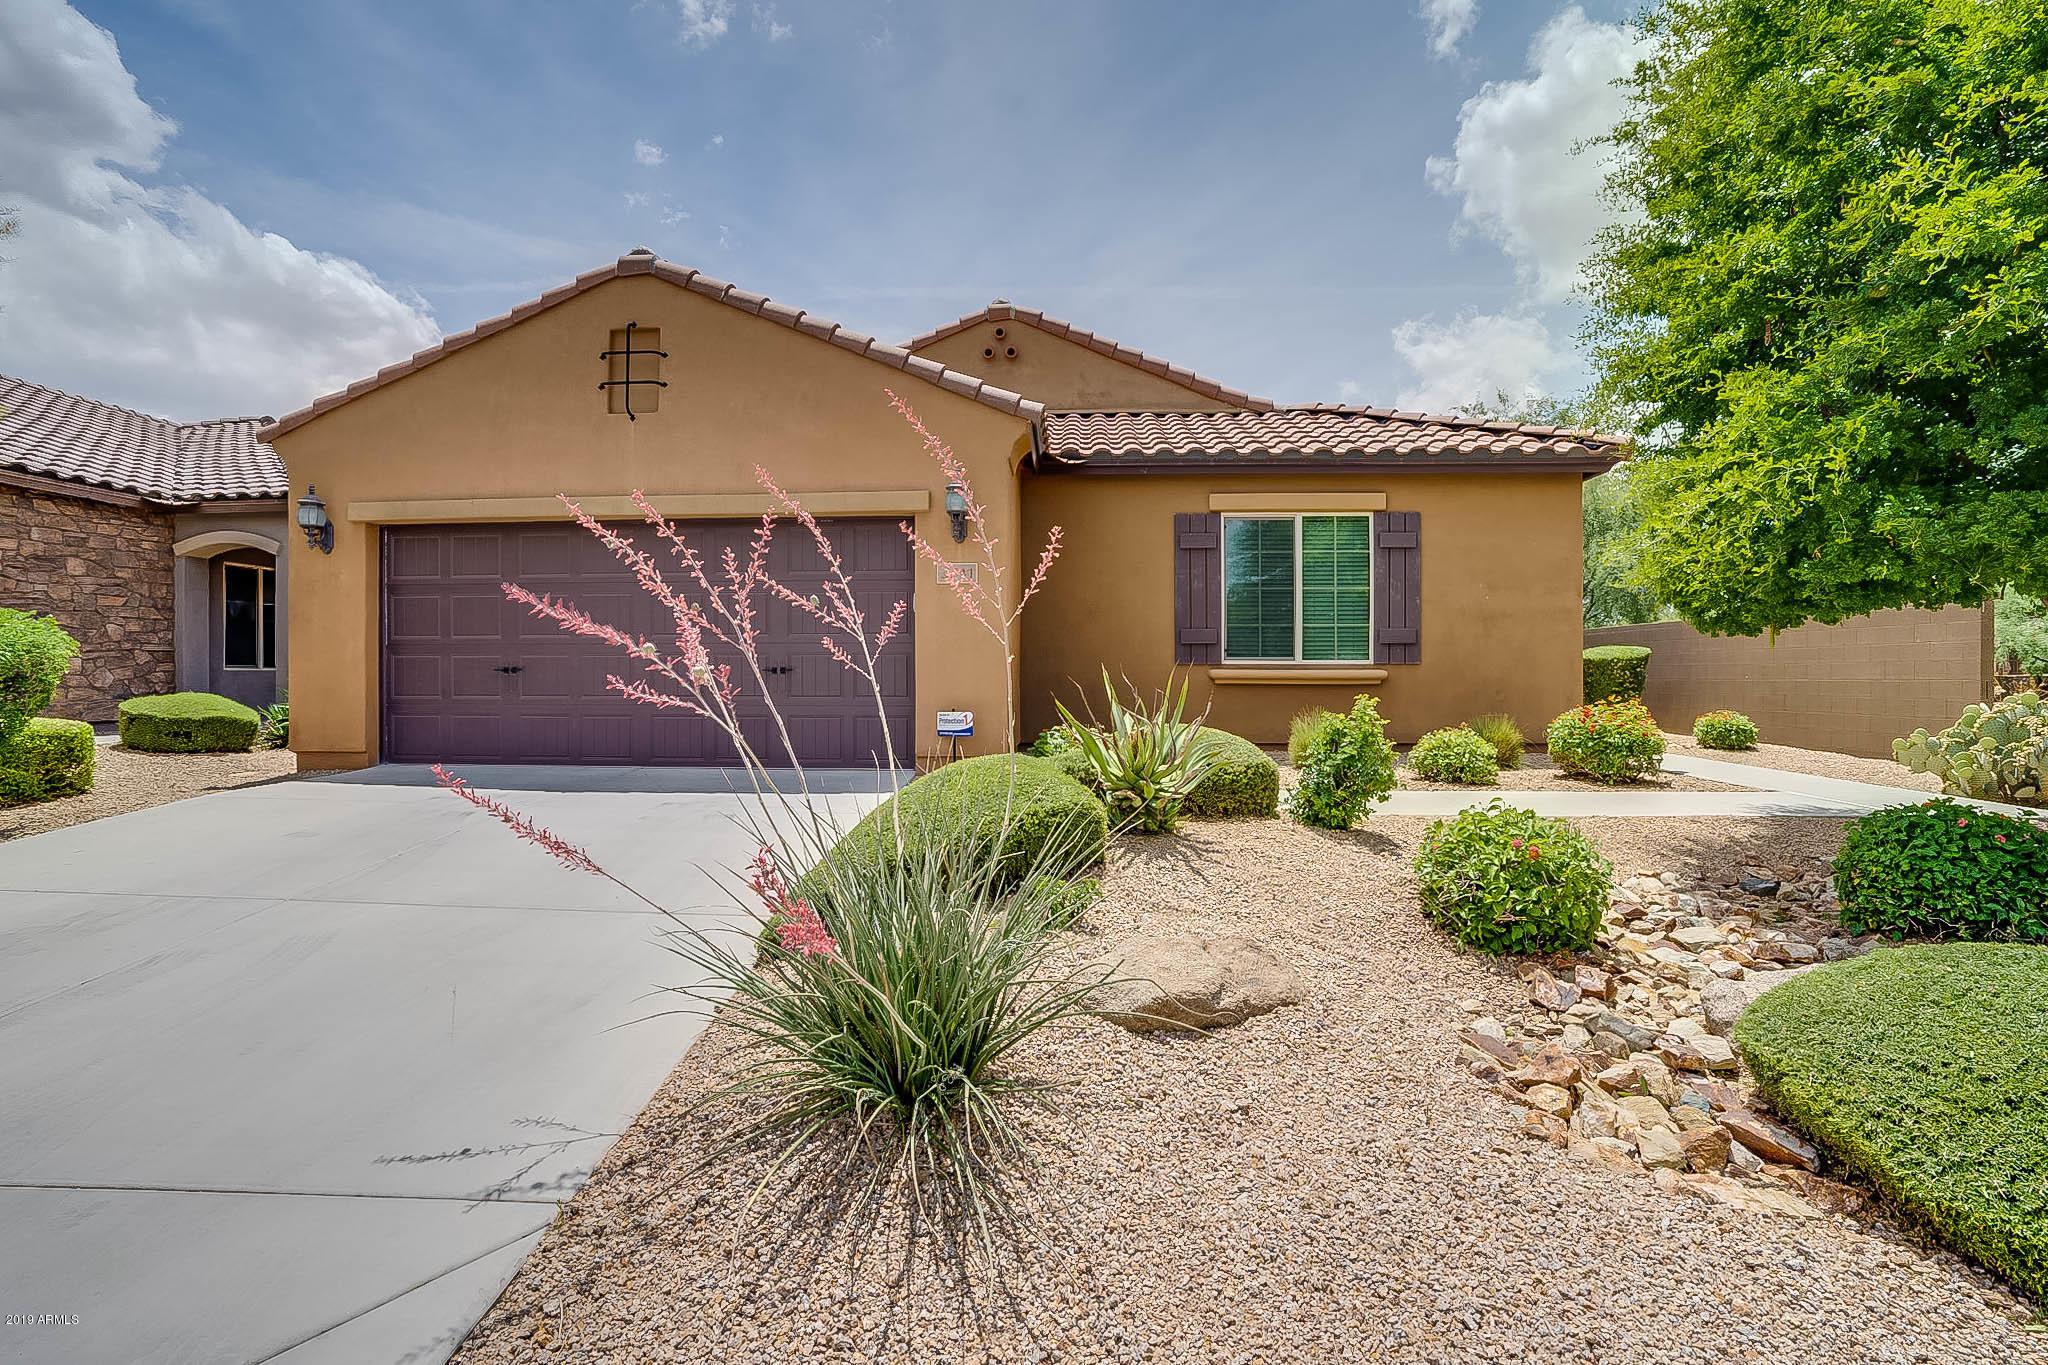 Photo for 3741 E Covey Lane, Phoenix, AZ 85050 (MLS # 5933219)